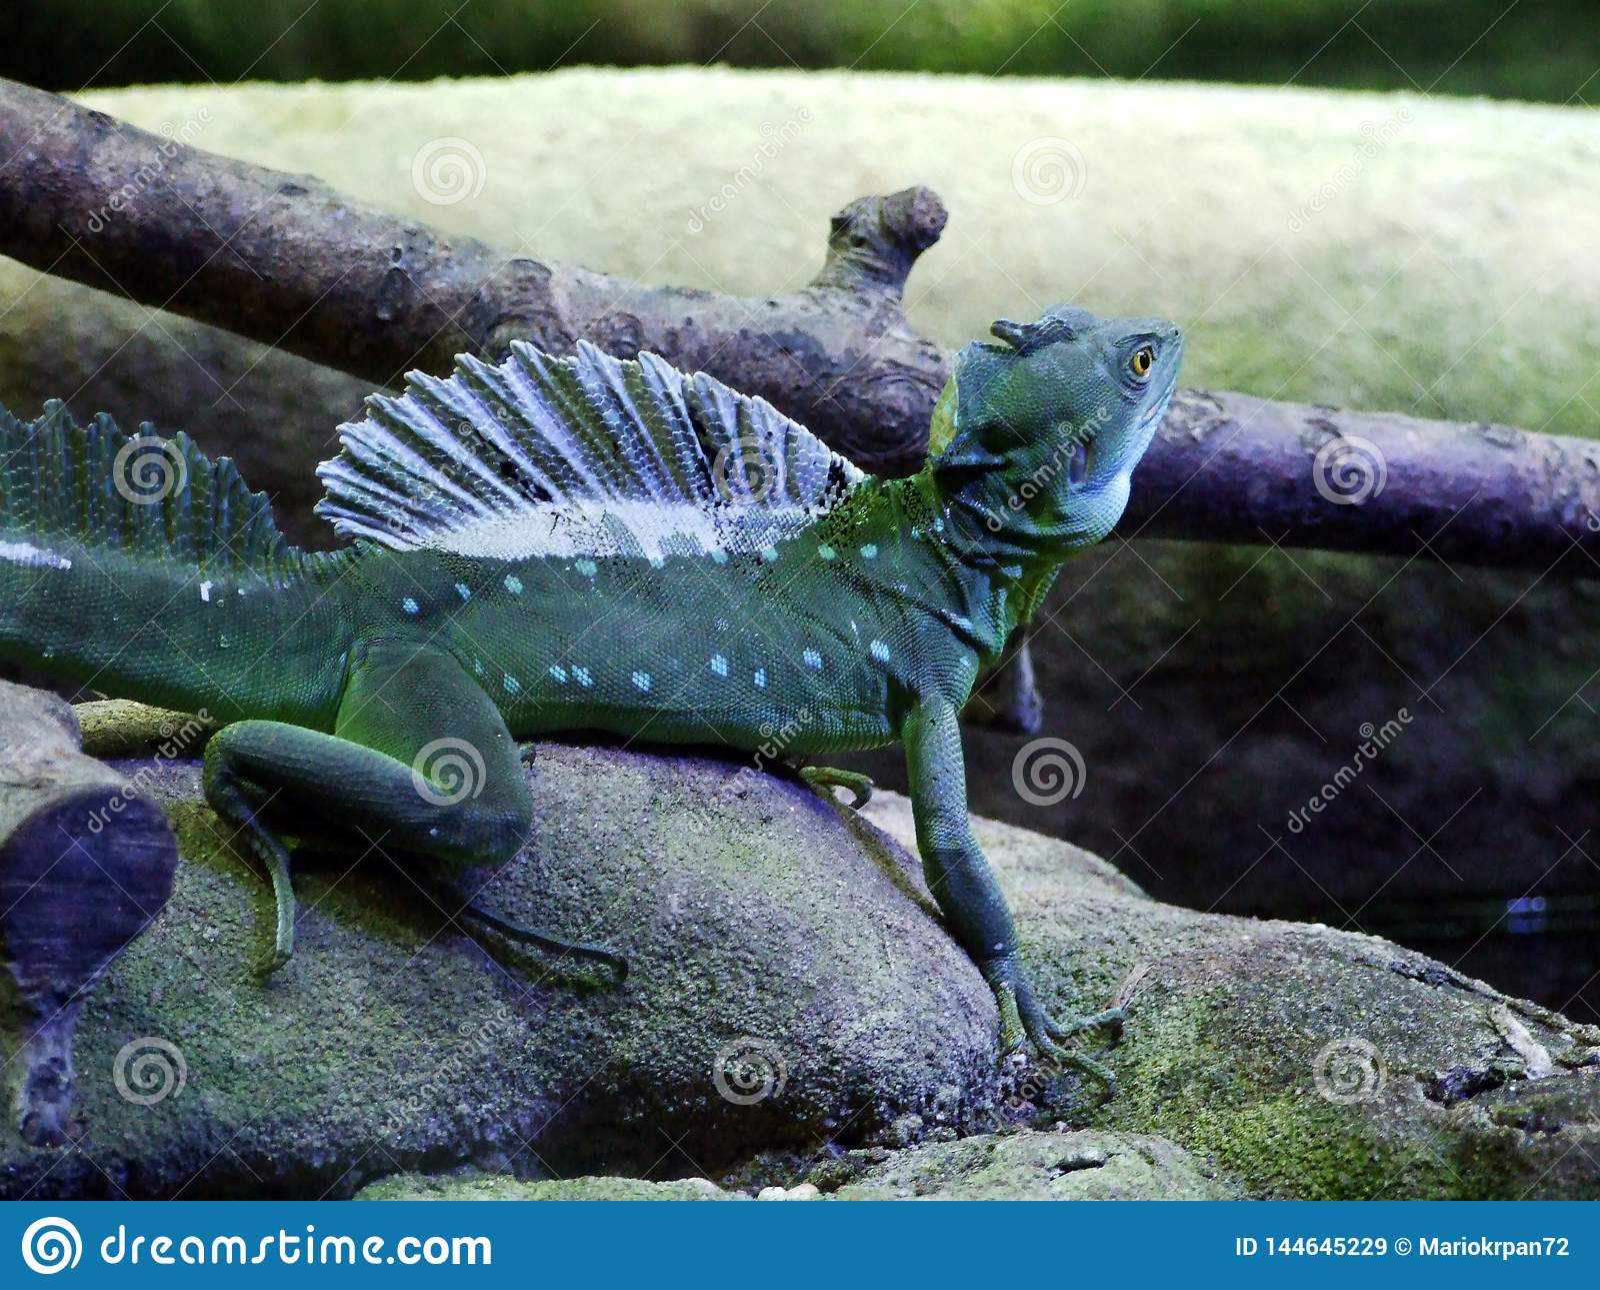 The plumed basilisk Basiliscus plumifrons, green basilisk, double crested basilisk, Jesus Christ lizard or Stirnlappenbasilisk